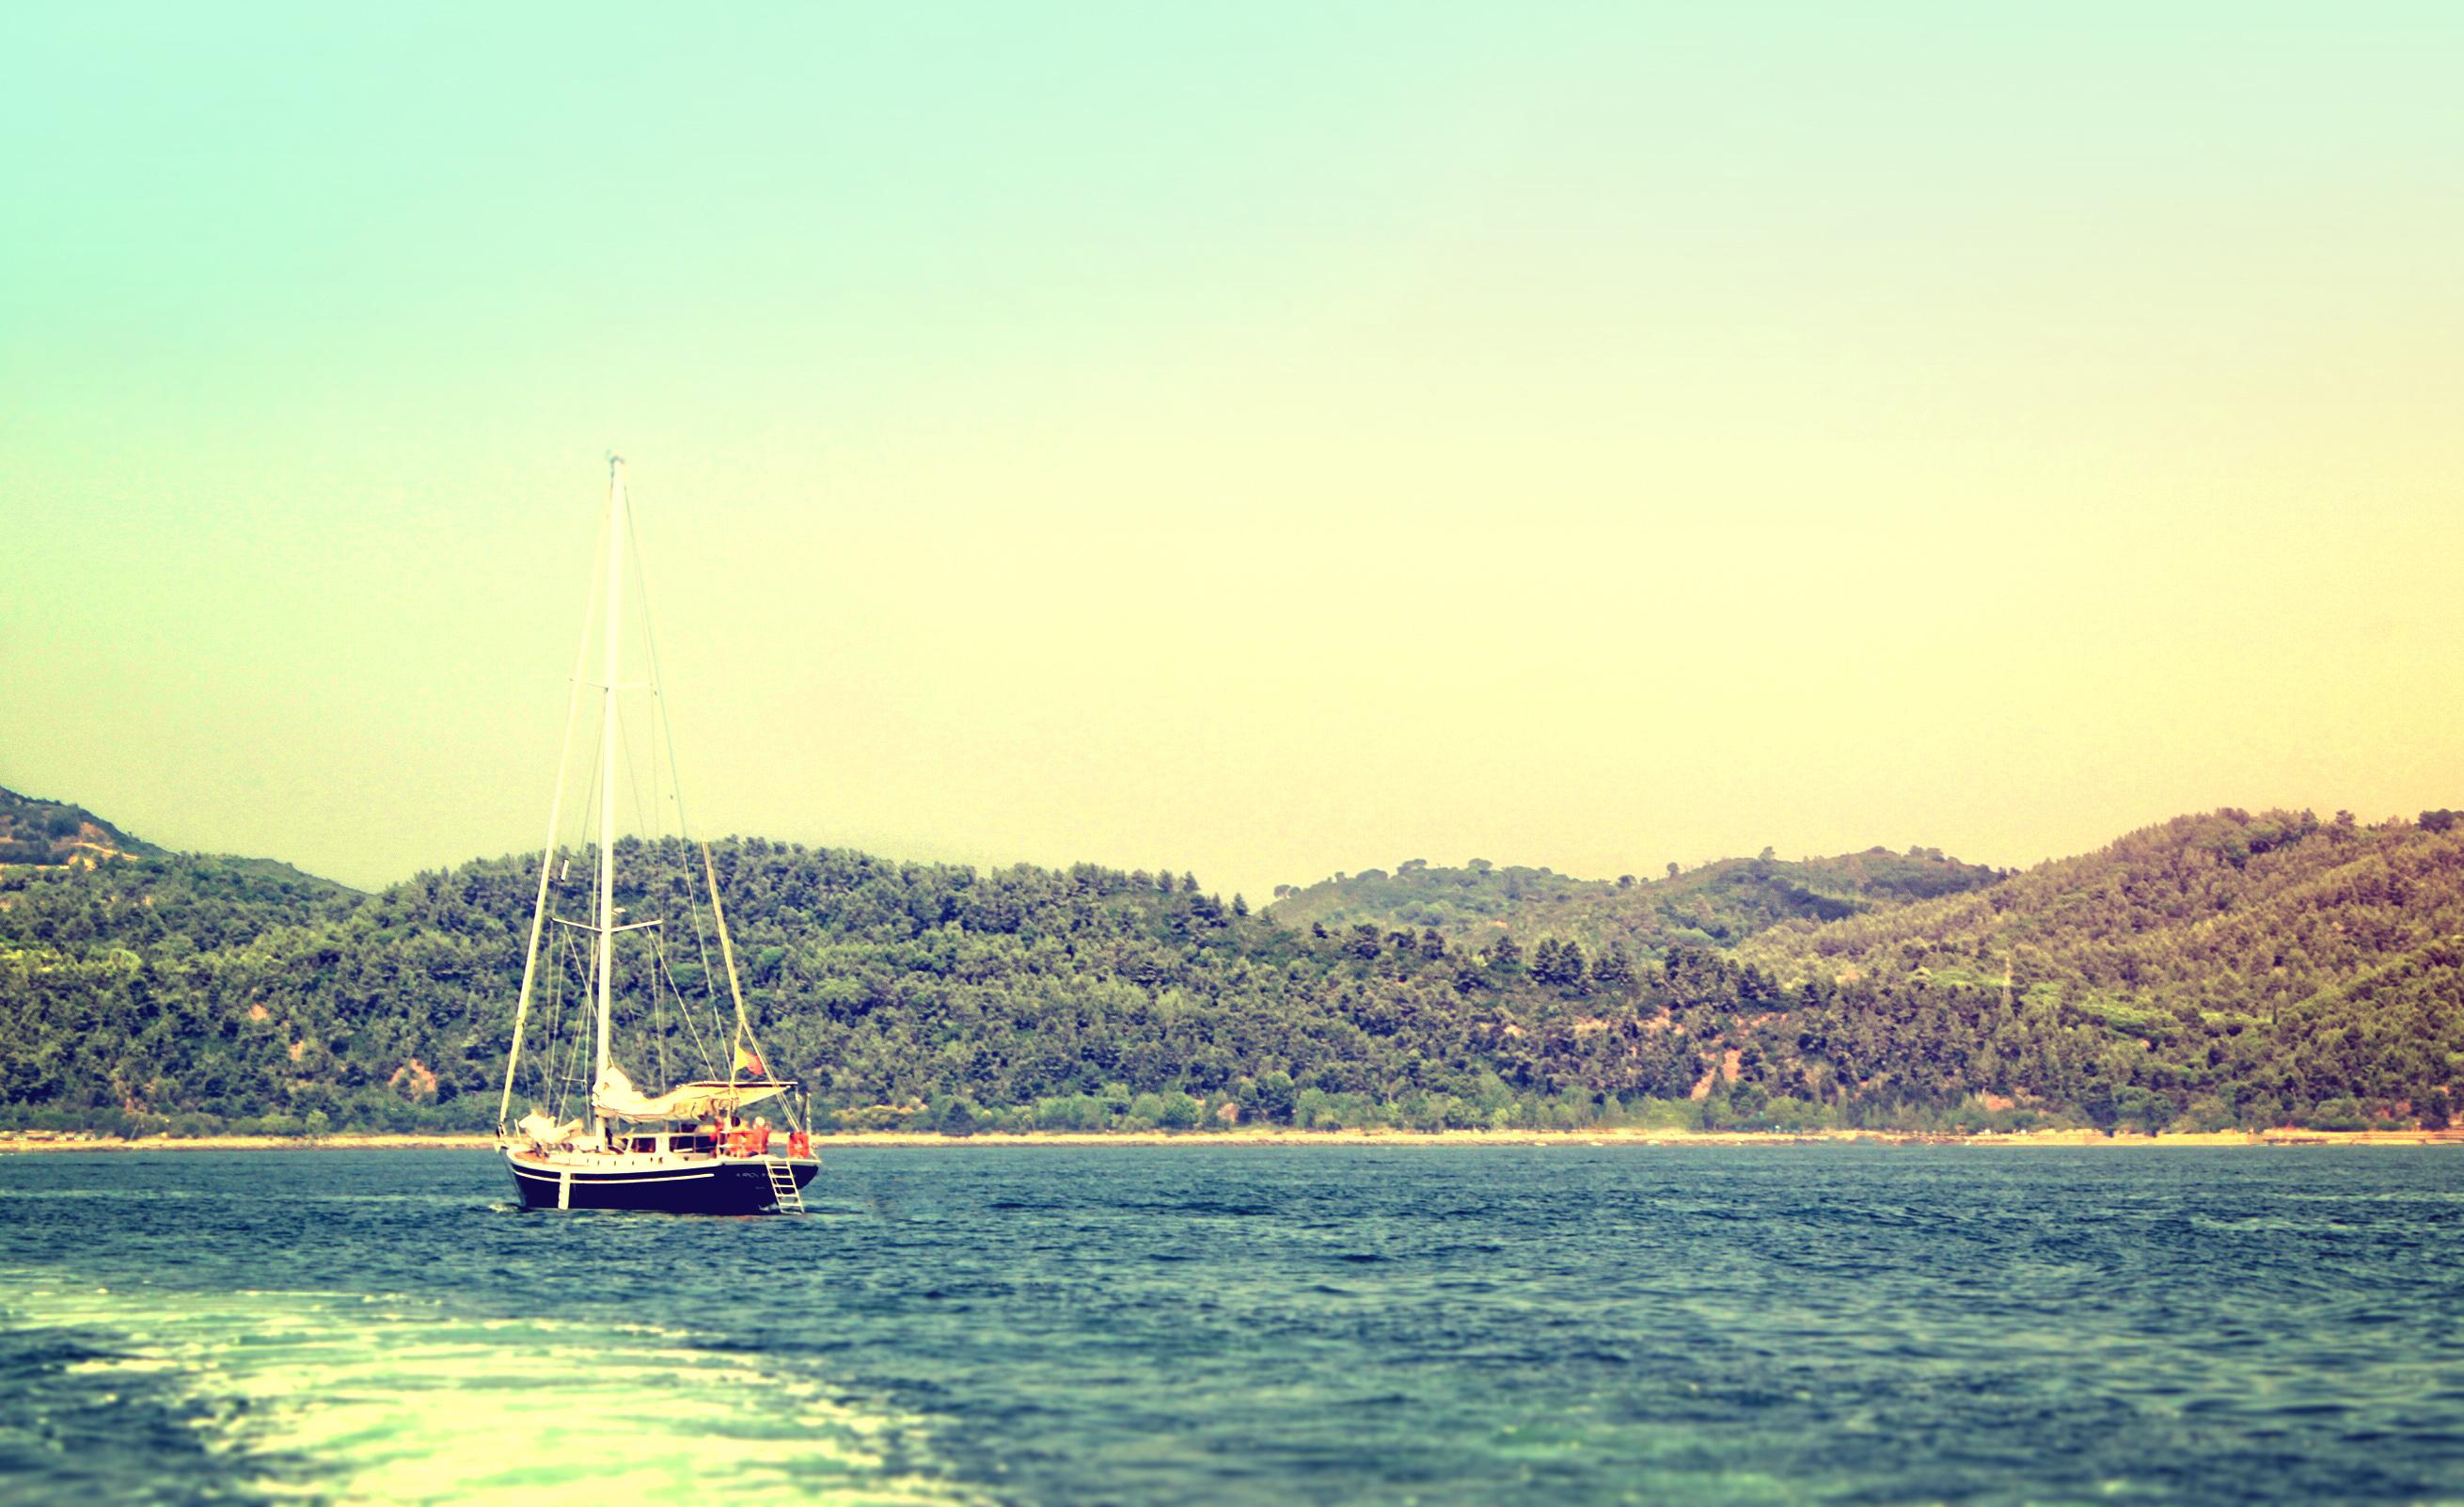 Vintage Sailboat, Aged, Regatta, Sea, Sailer, HQ Photo